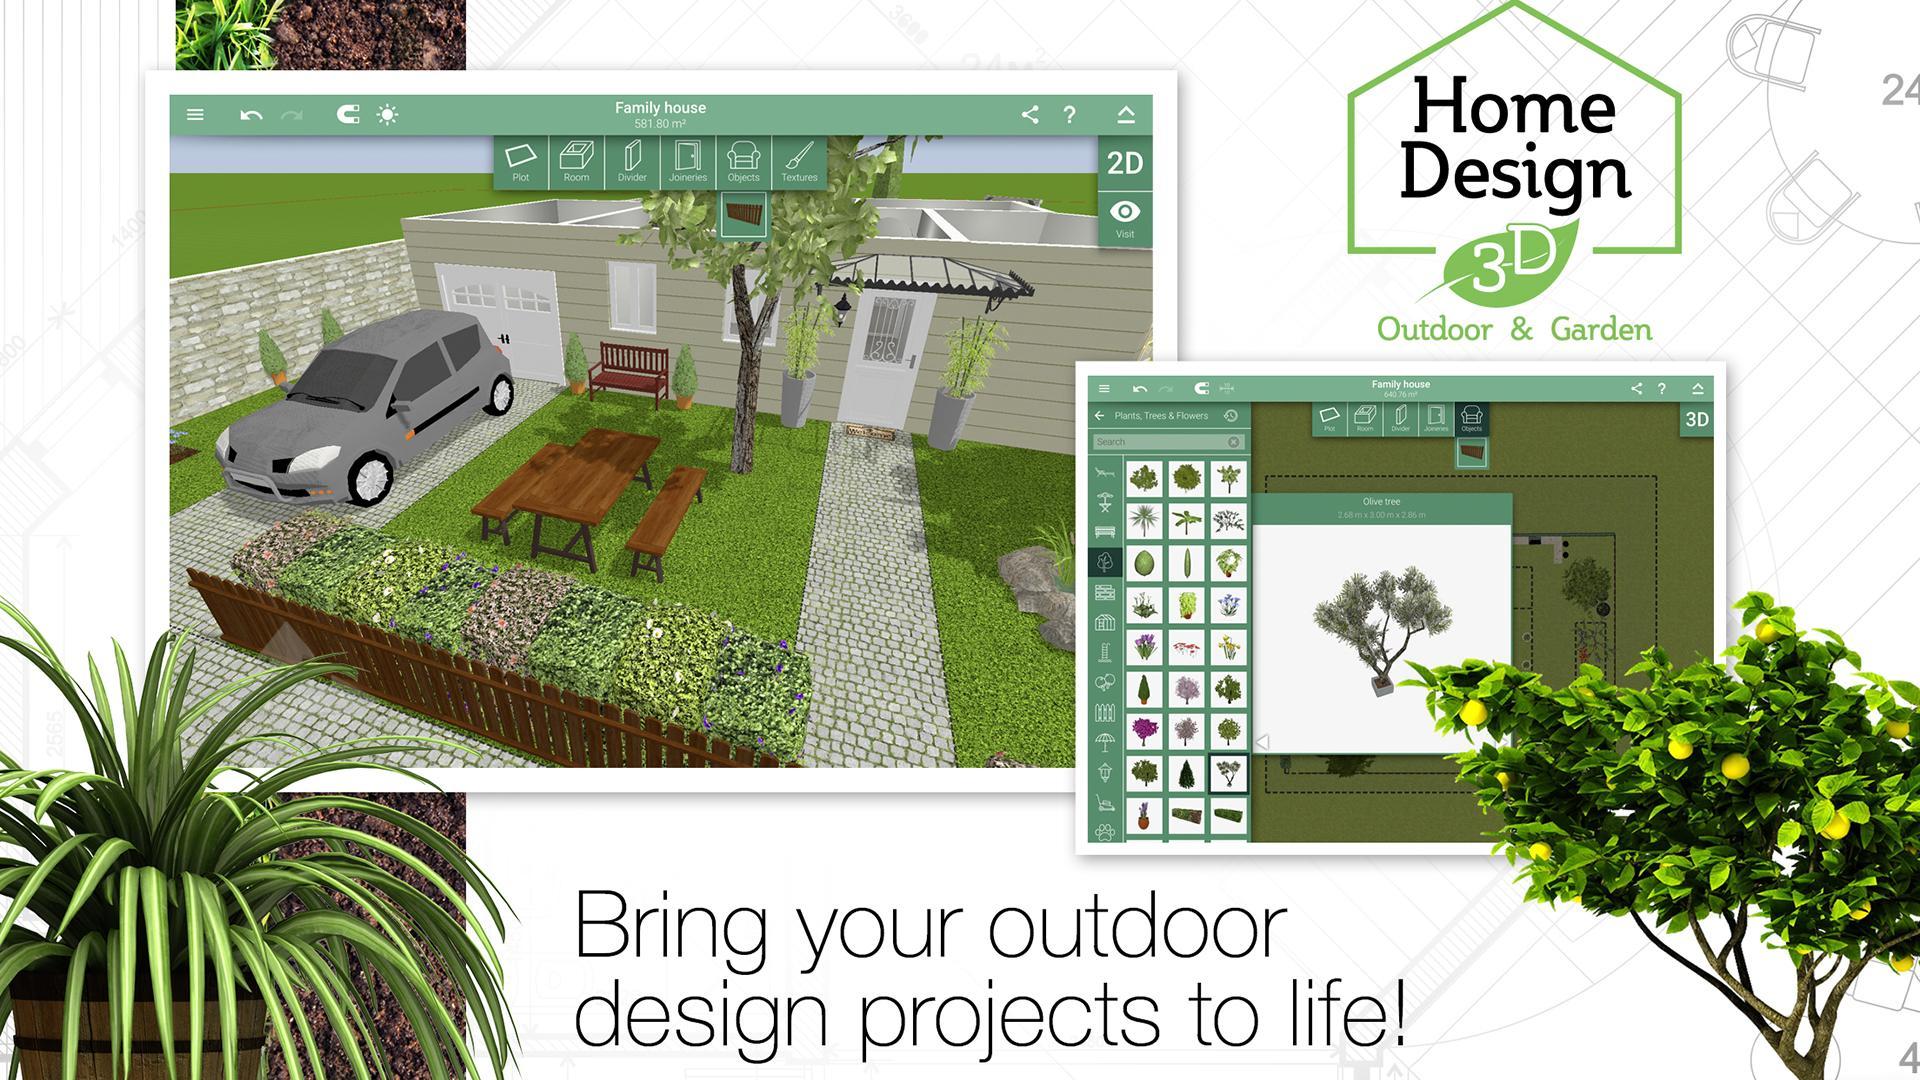 Home Design 3d Outdoor Garden Apk 4 4 1 Download For Android Download Home Design 3d Outdoor Garden Xapk Apk Obb Data Latest Version Apkfab Com